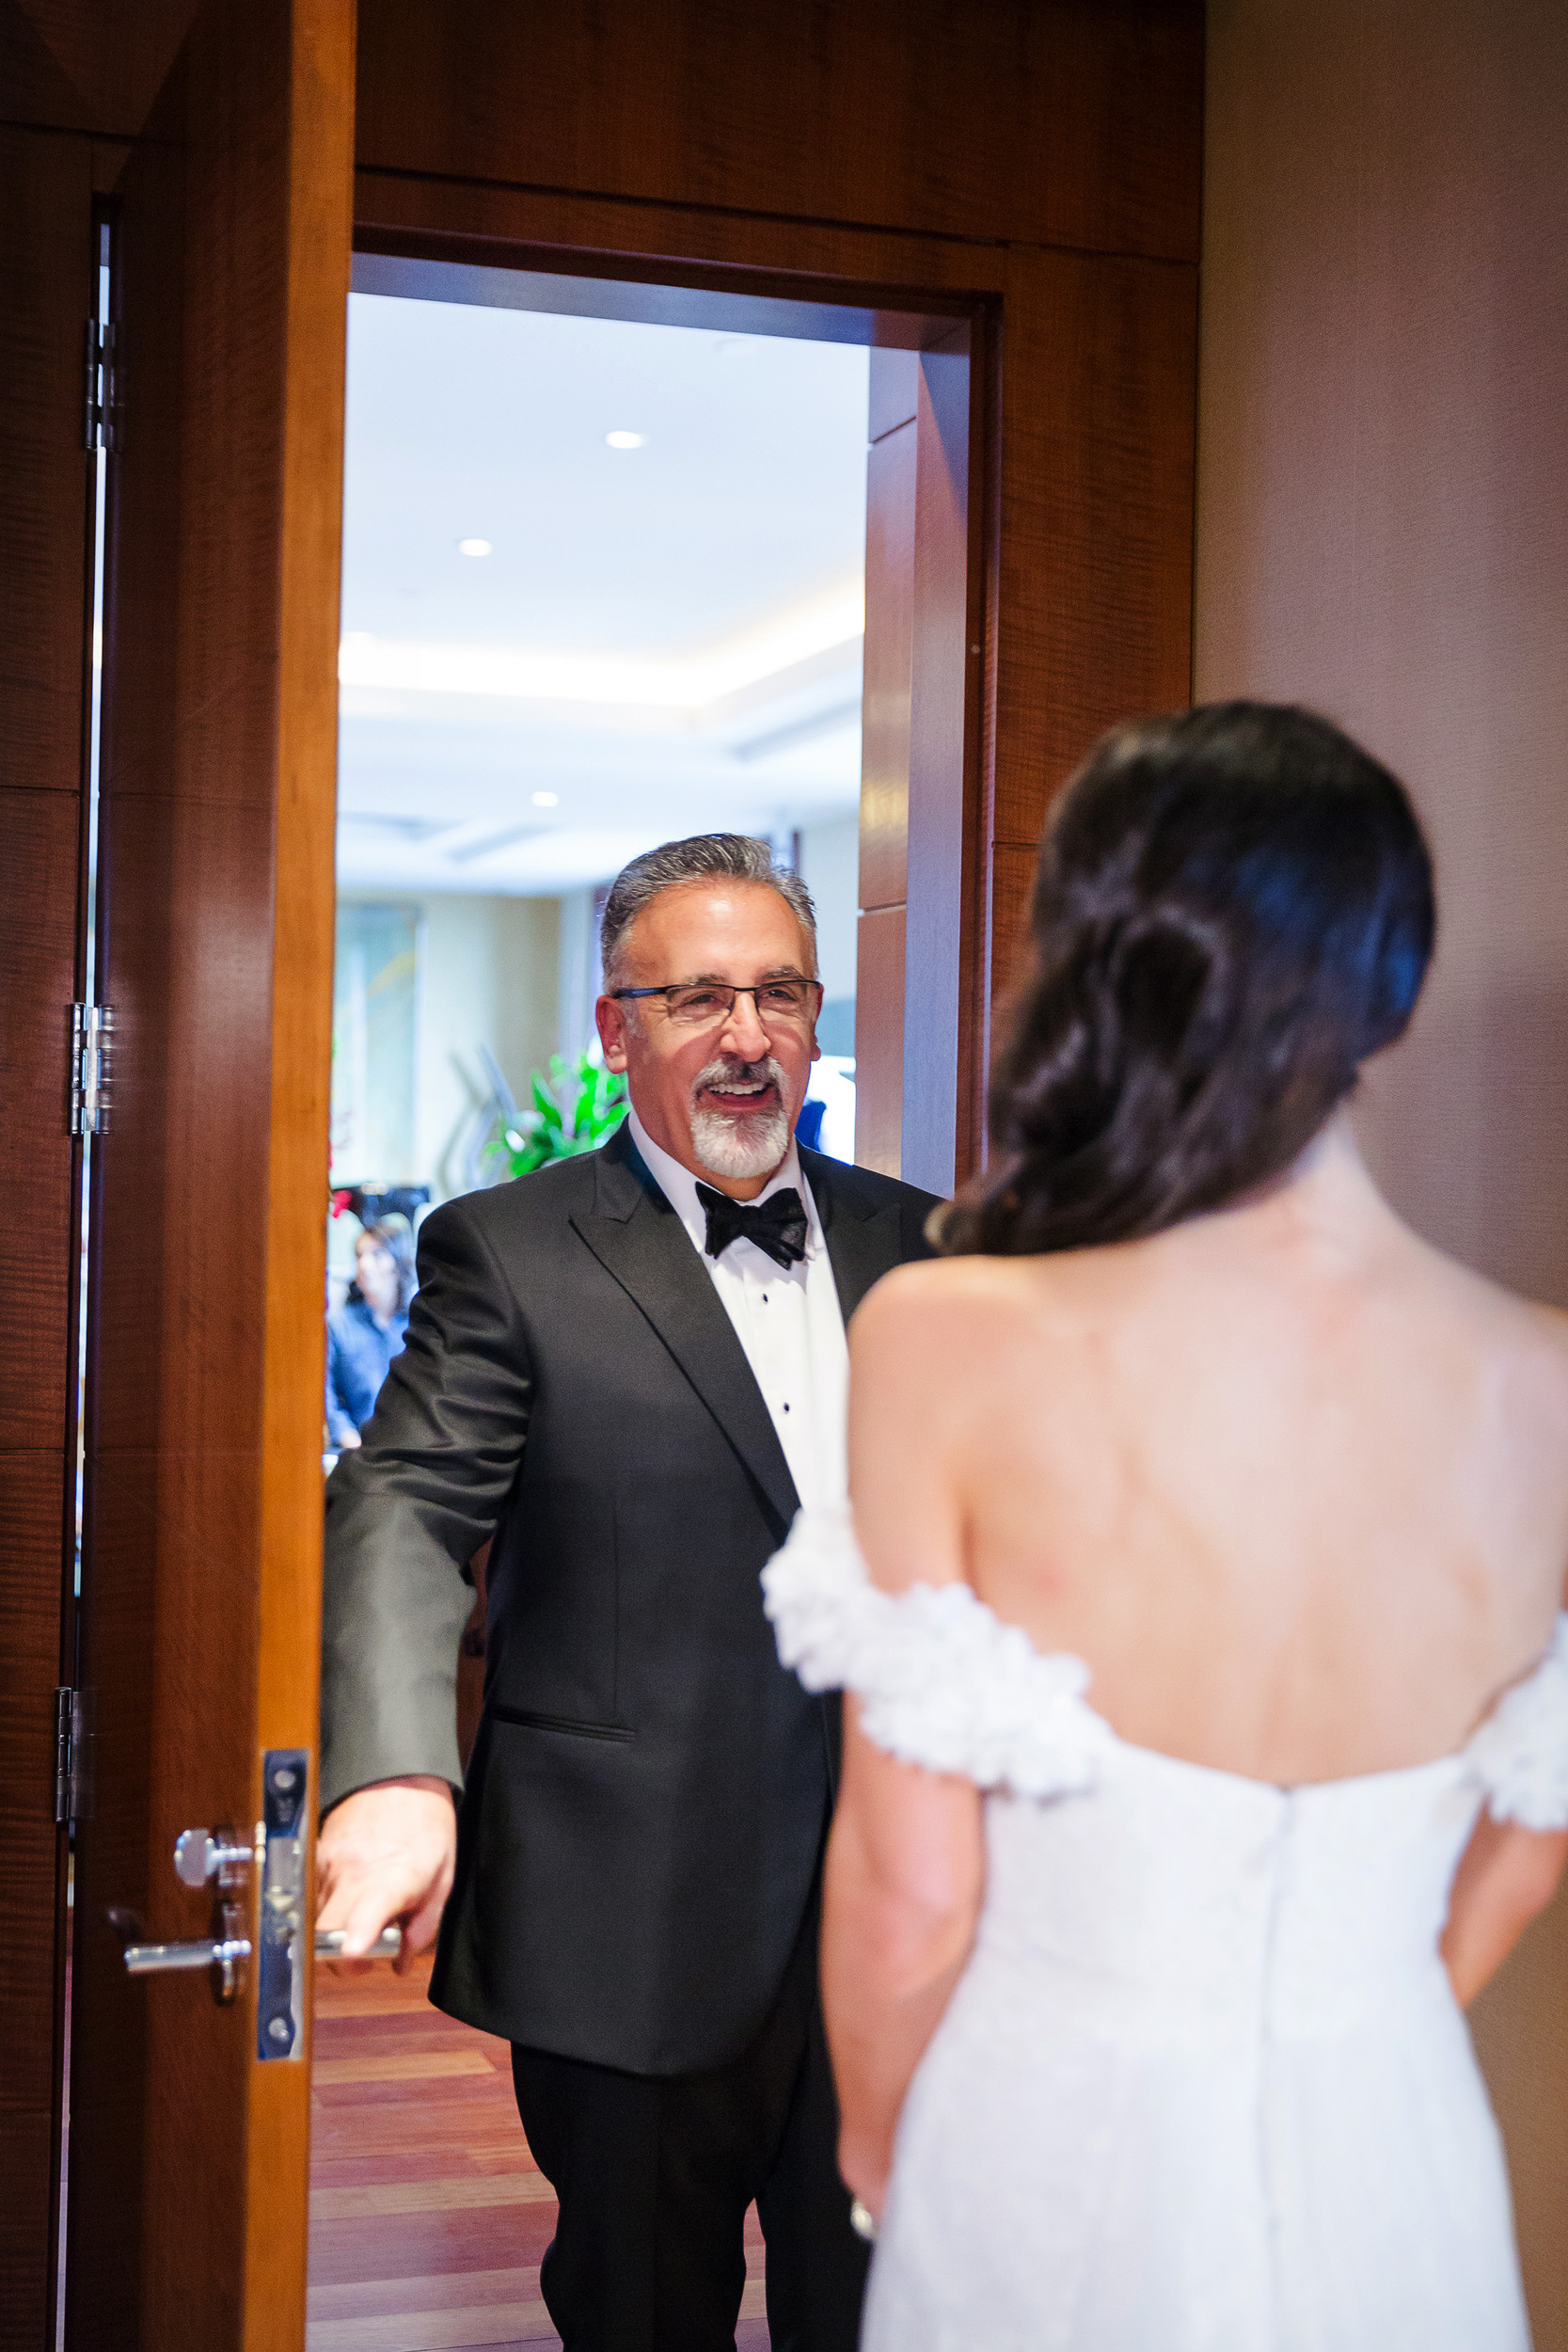 DCPA-Wedding-017.jpg